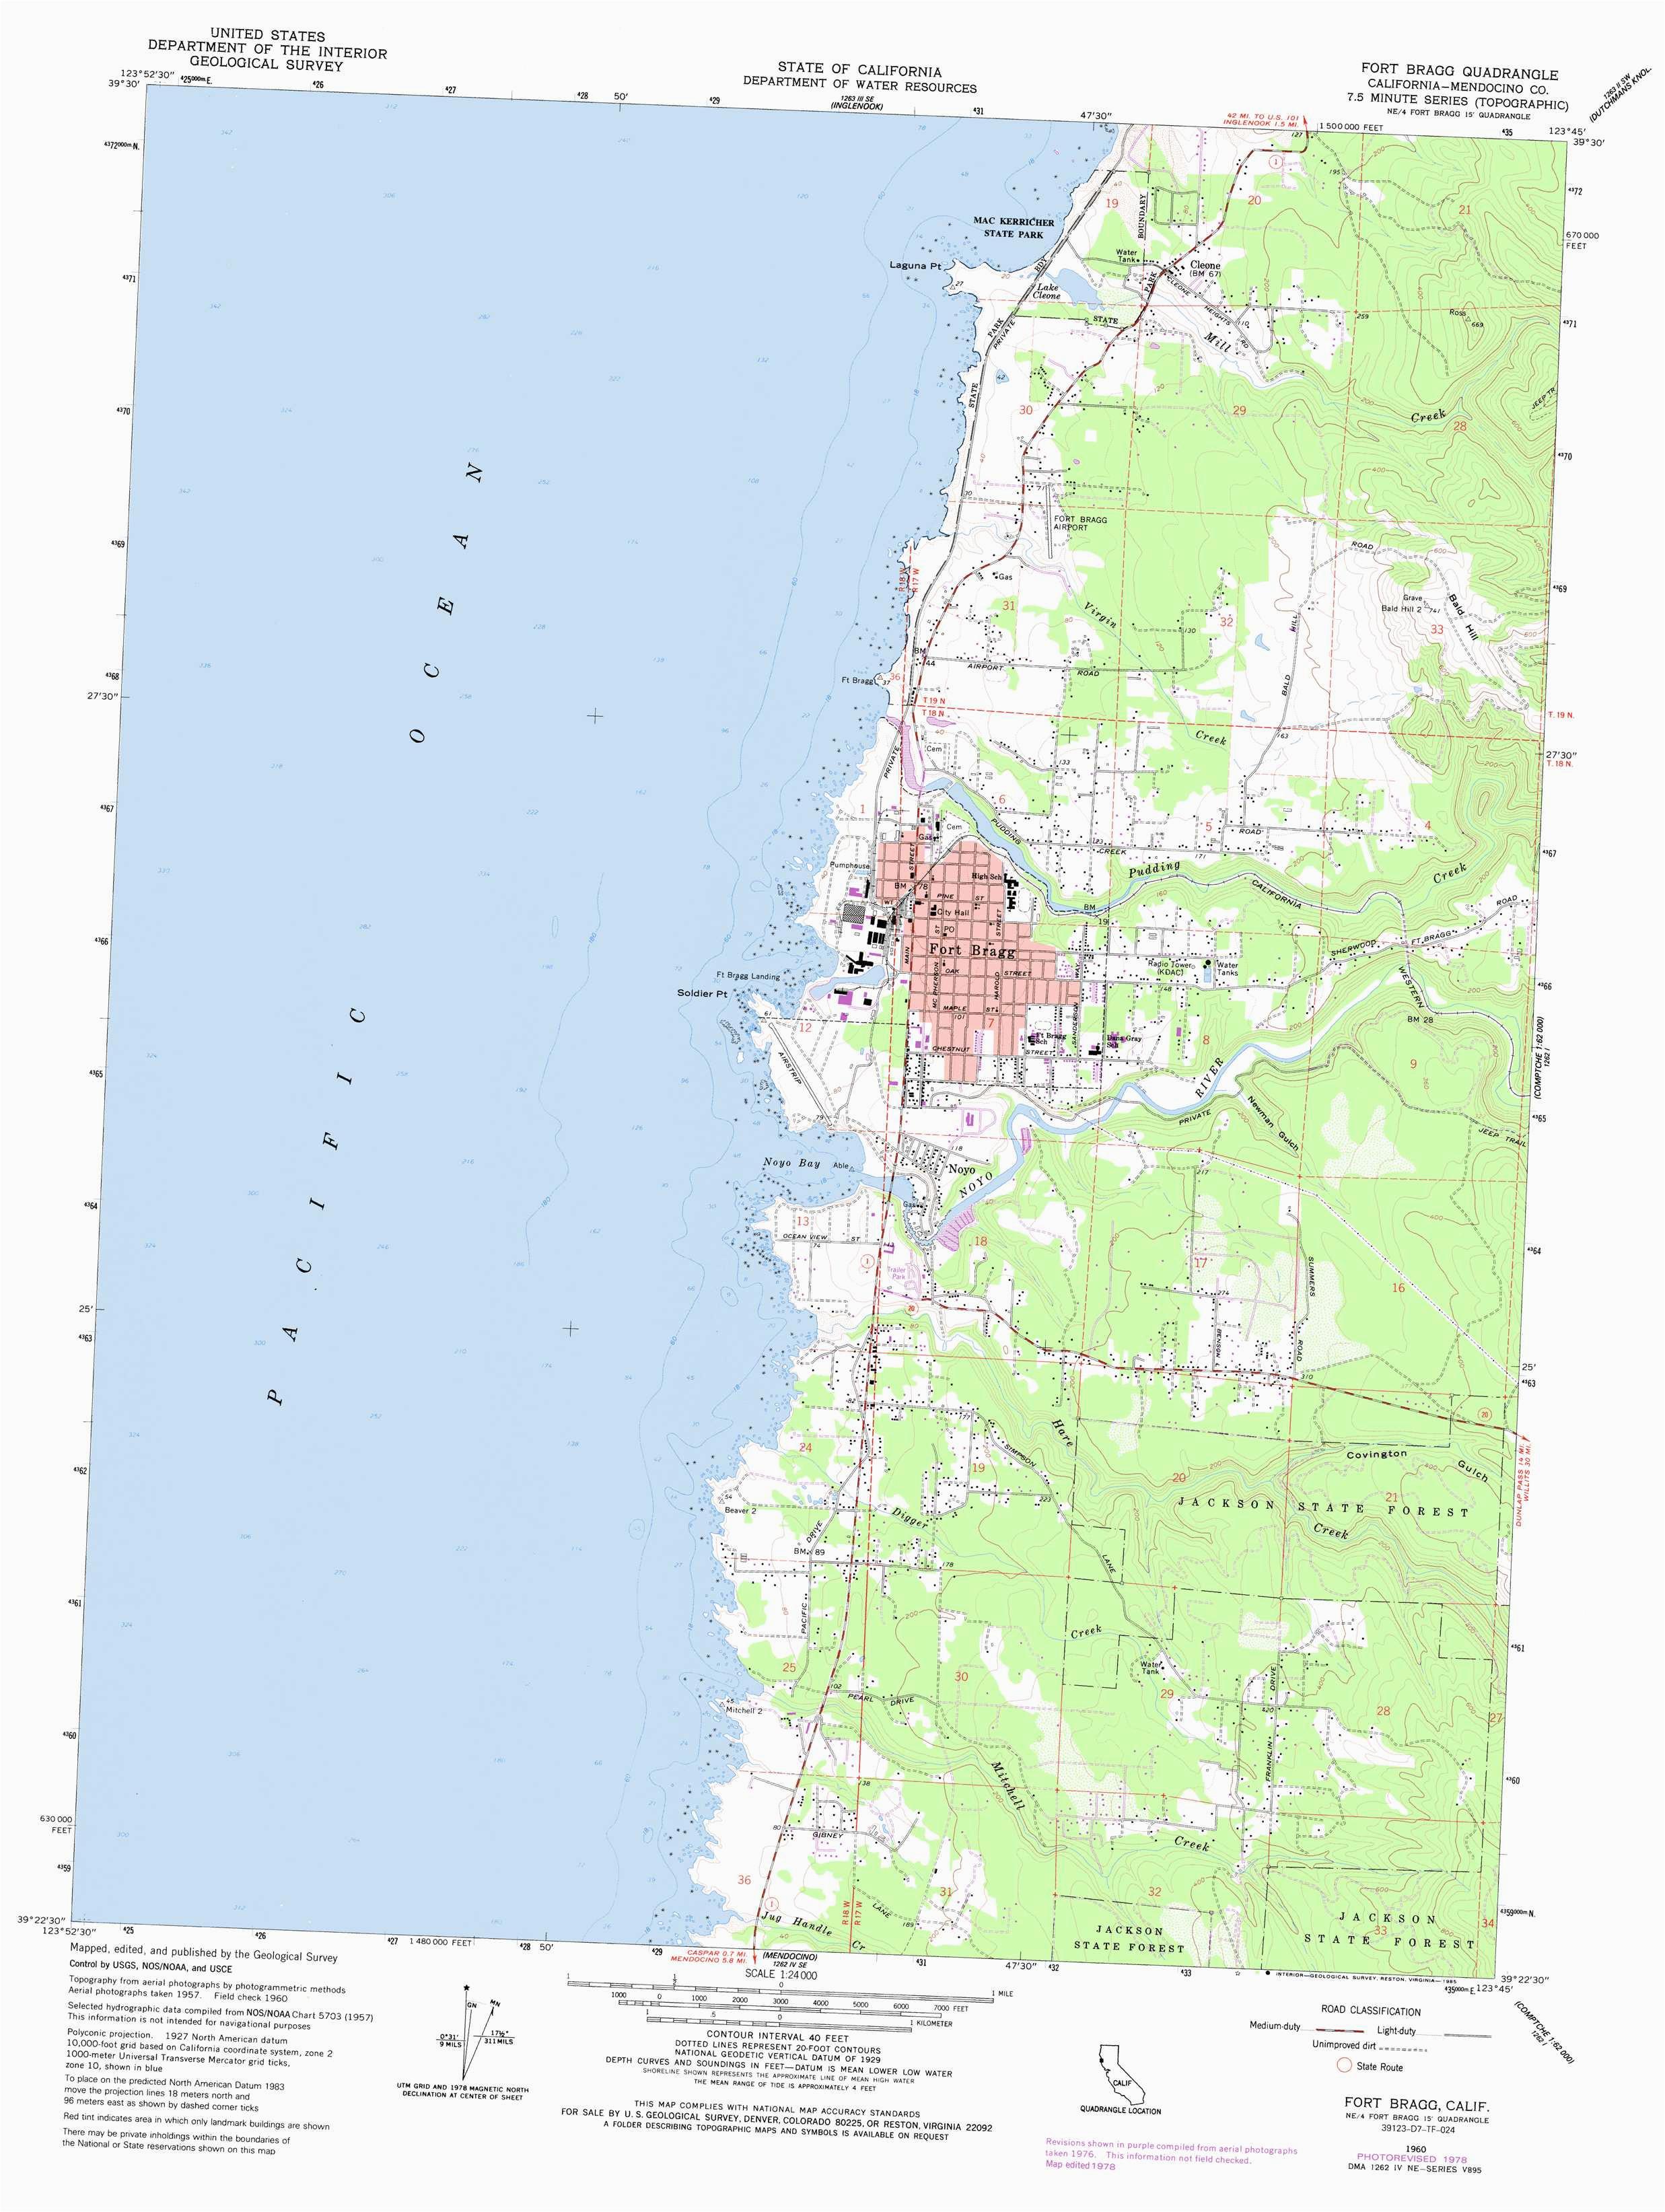 Koa Campgrounds California Map fort gg Map Lovely Harbor ... on california ca map, california driving map, california beach camping map, hayfork california map, california recreation map, california surf spot map, california rest area map,